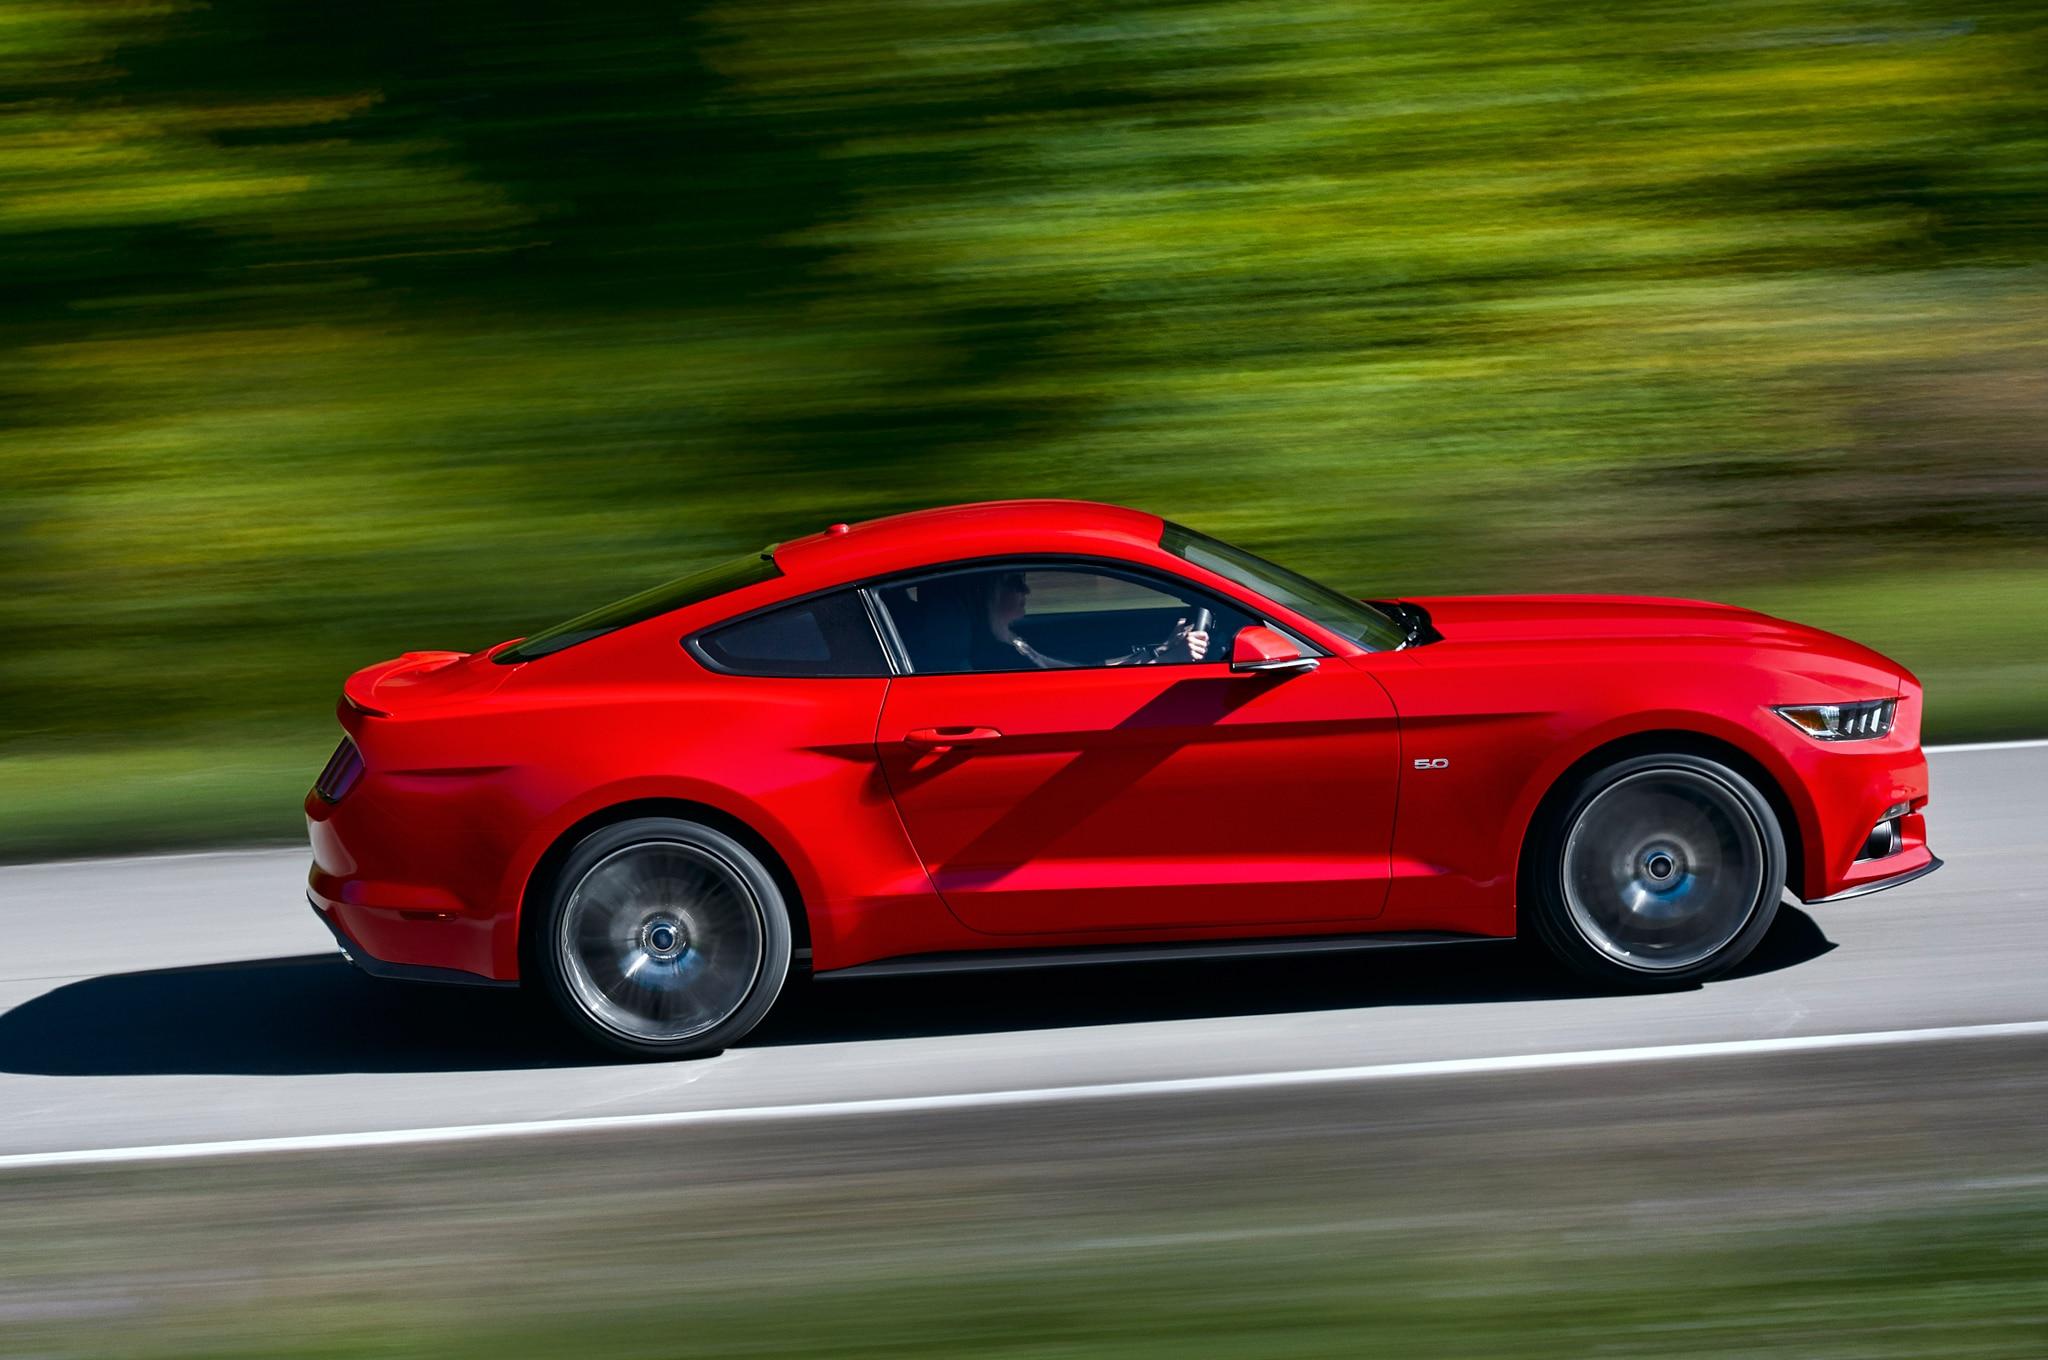 Mustang Nascar Pace Car